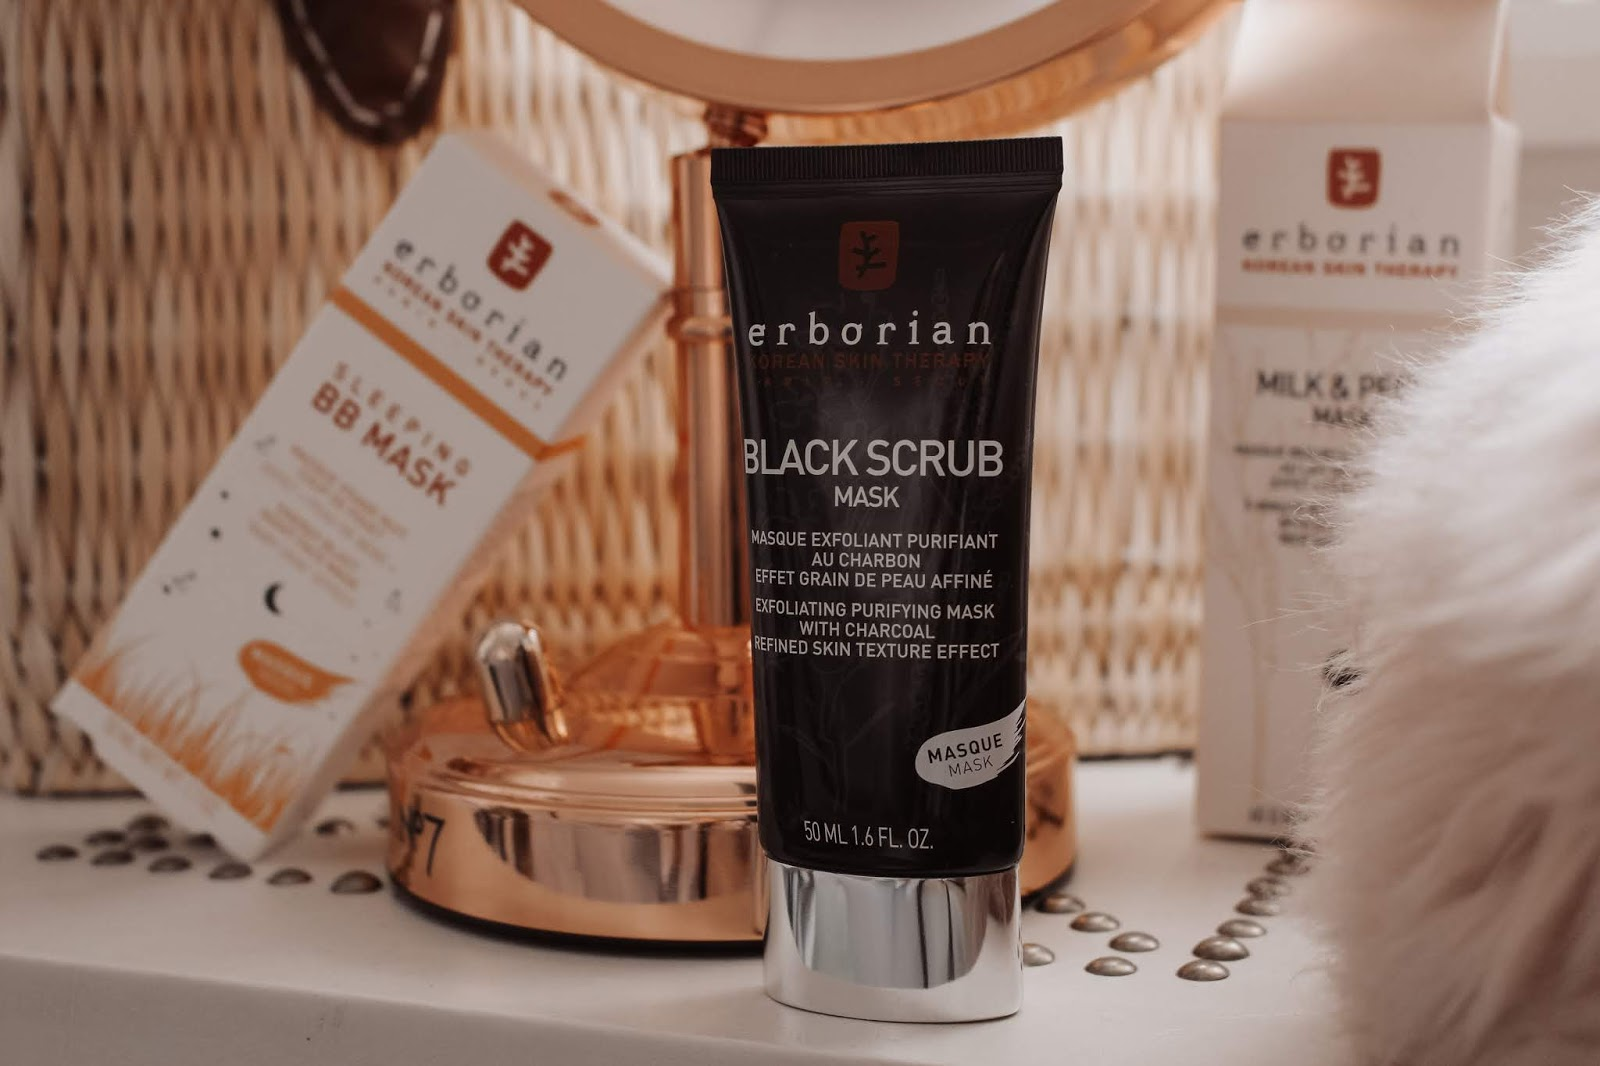 Erborian Black Scrub Mask beauty blogger review